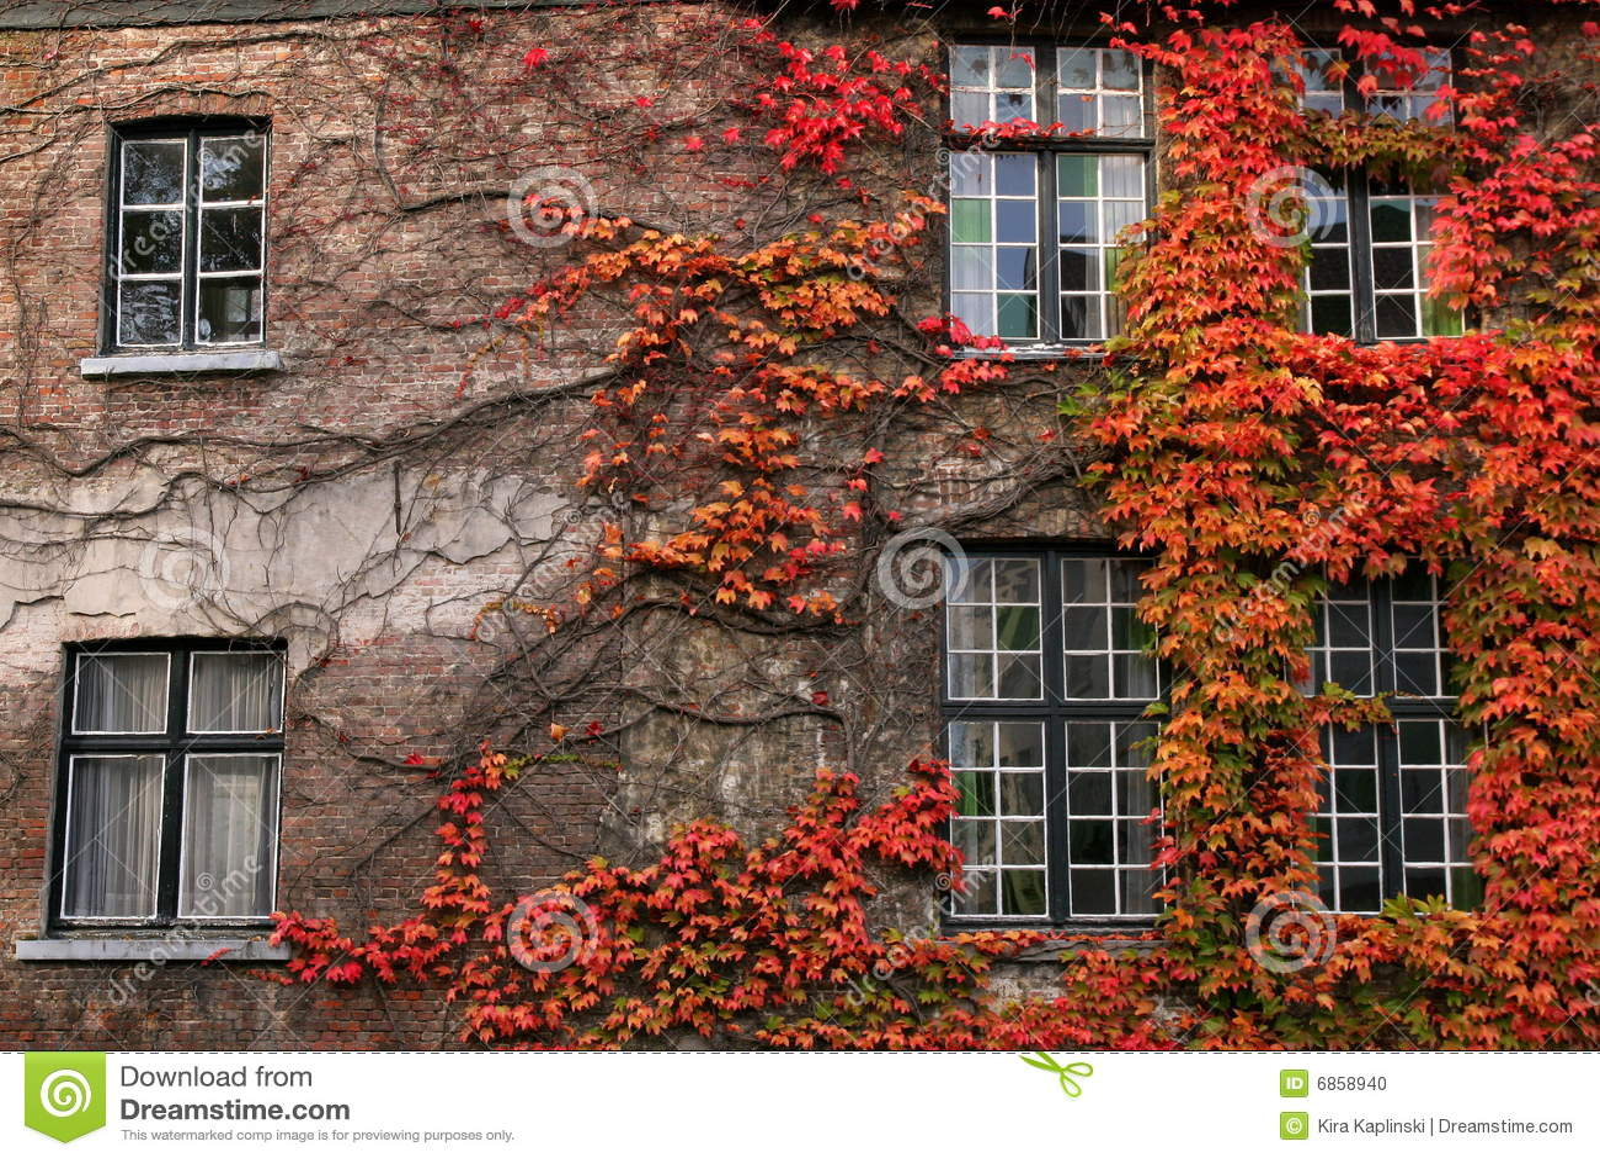 осеннее листво